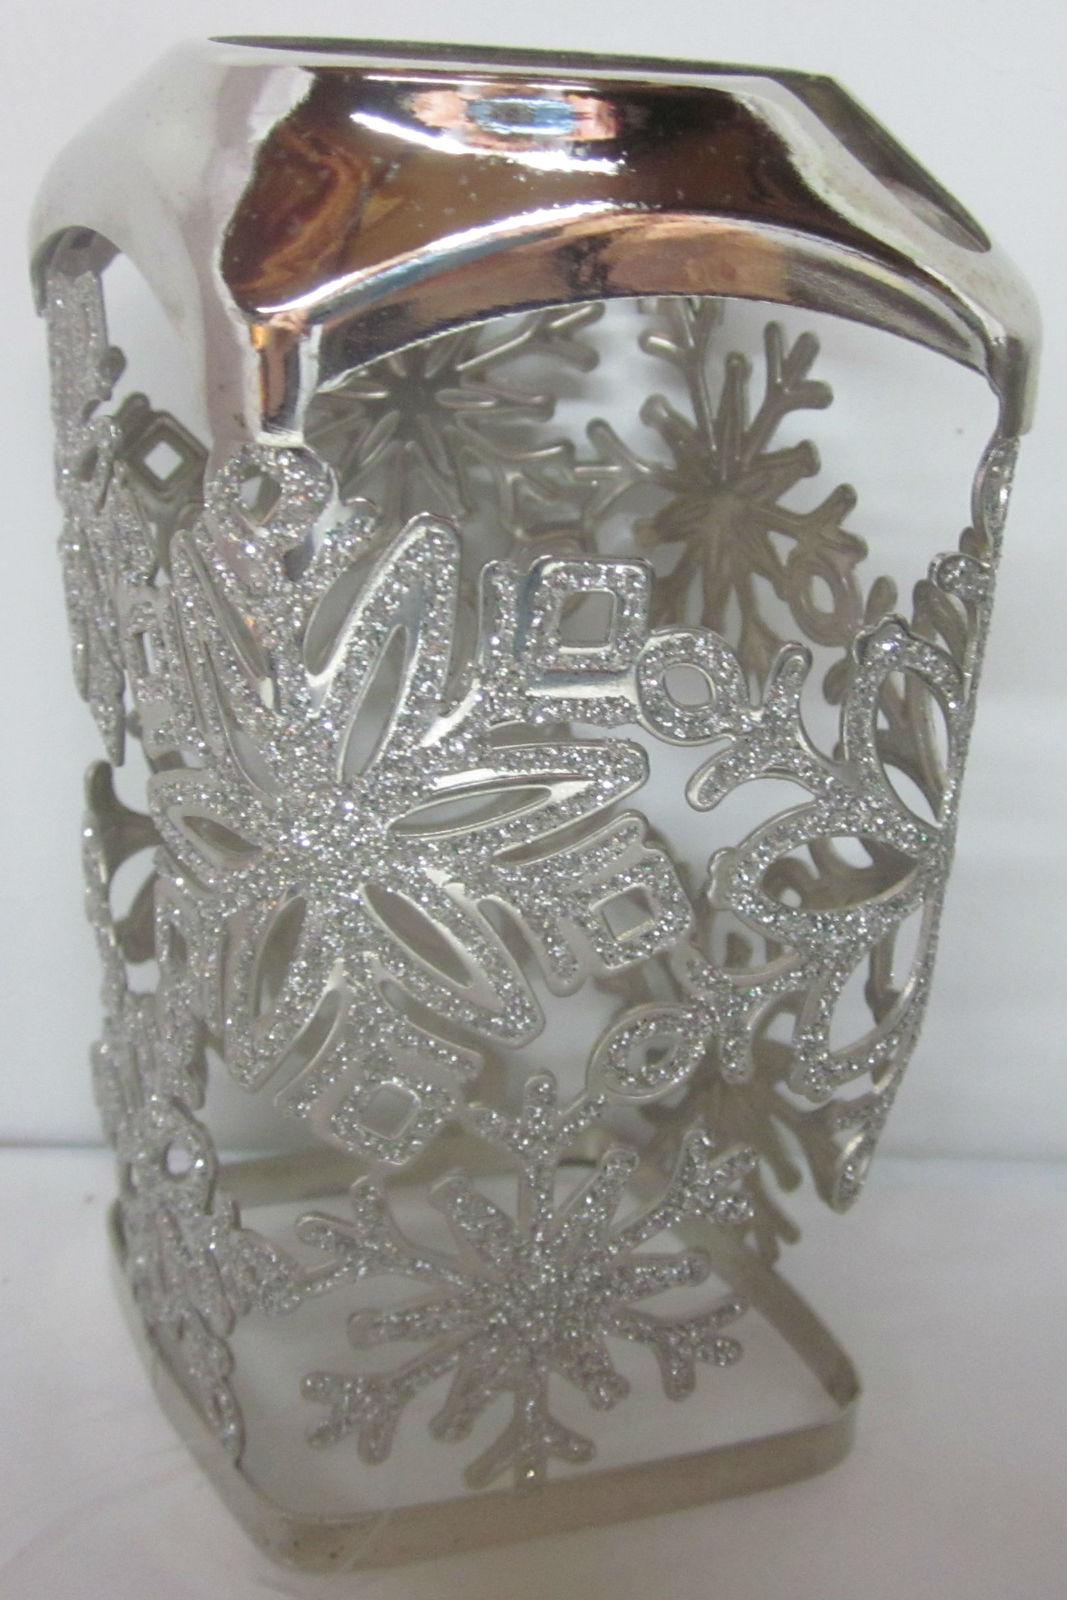 Bath & Body Works Gentle Foaming Hand Soap Sleeve Holder Glitter Snowflakes